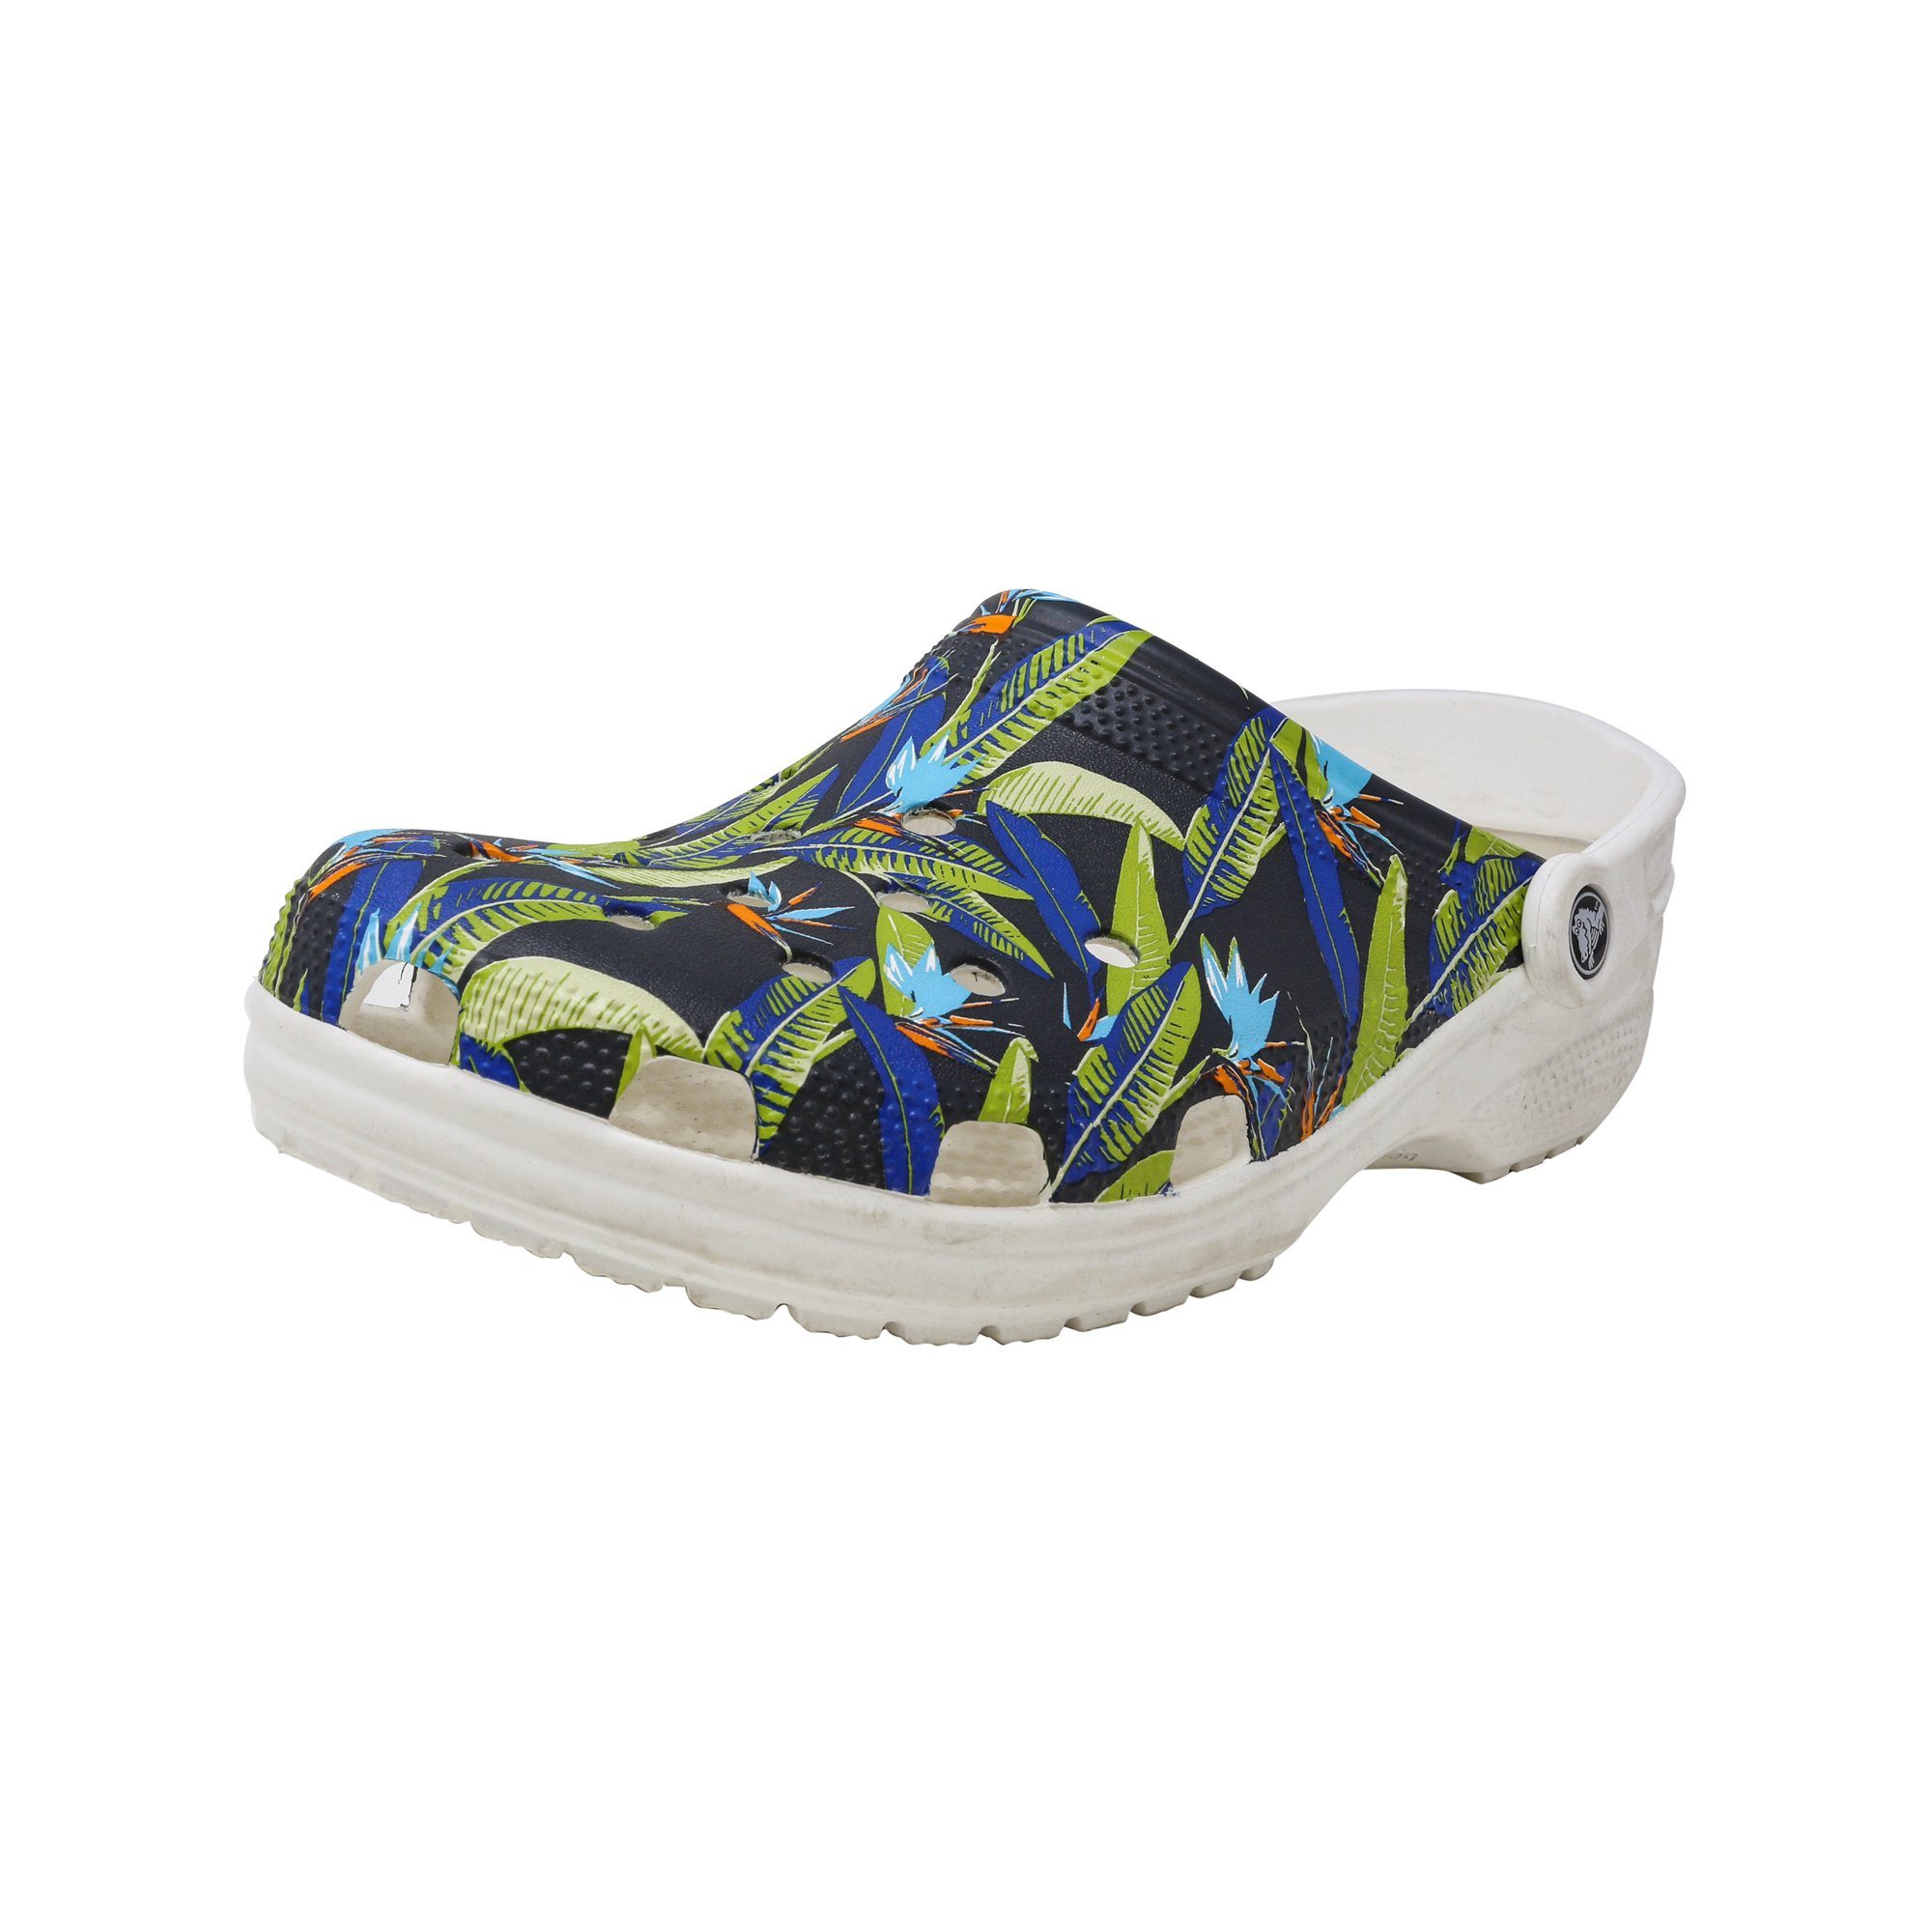 0f651f820eb85f Buy Crocs Classic Tropical Iv Clog White Ankle-High Clogs - 10M - 8M ...